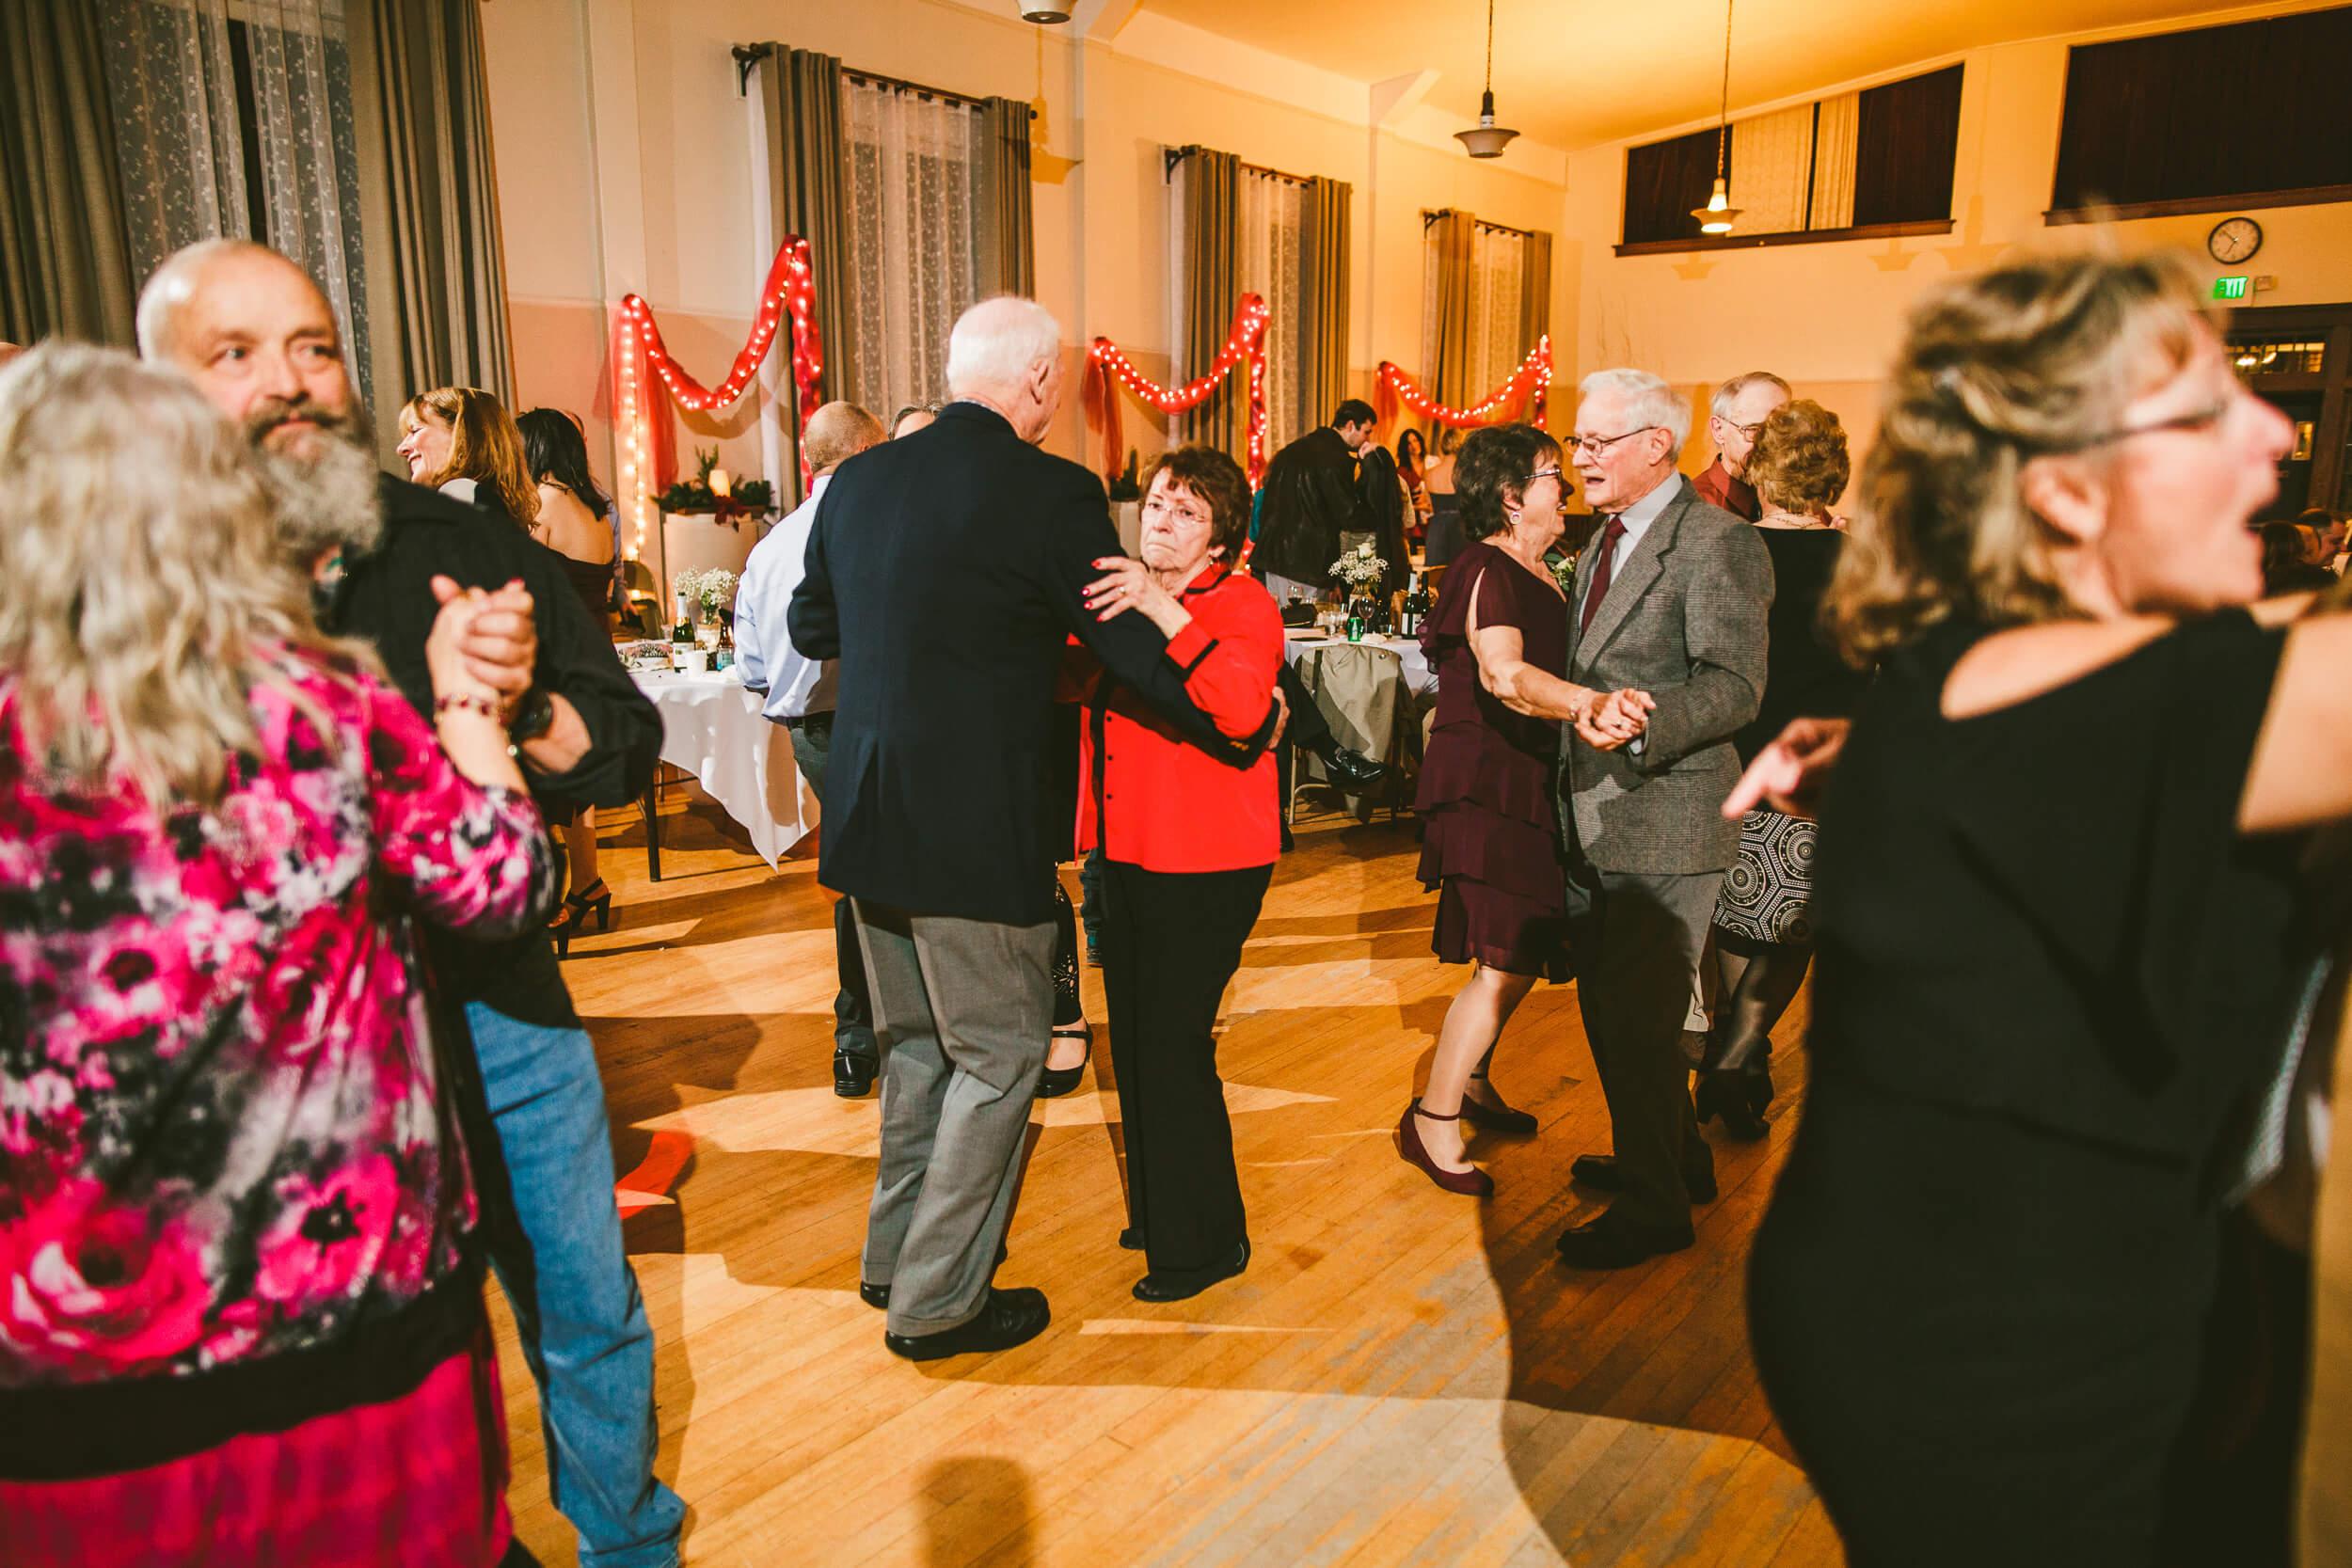 mukogawa winter wedding in spokane (305).jpg